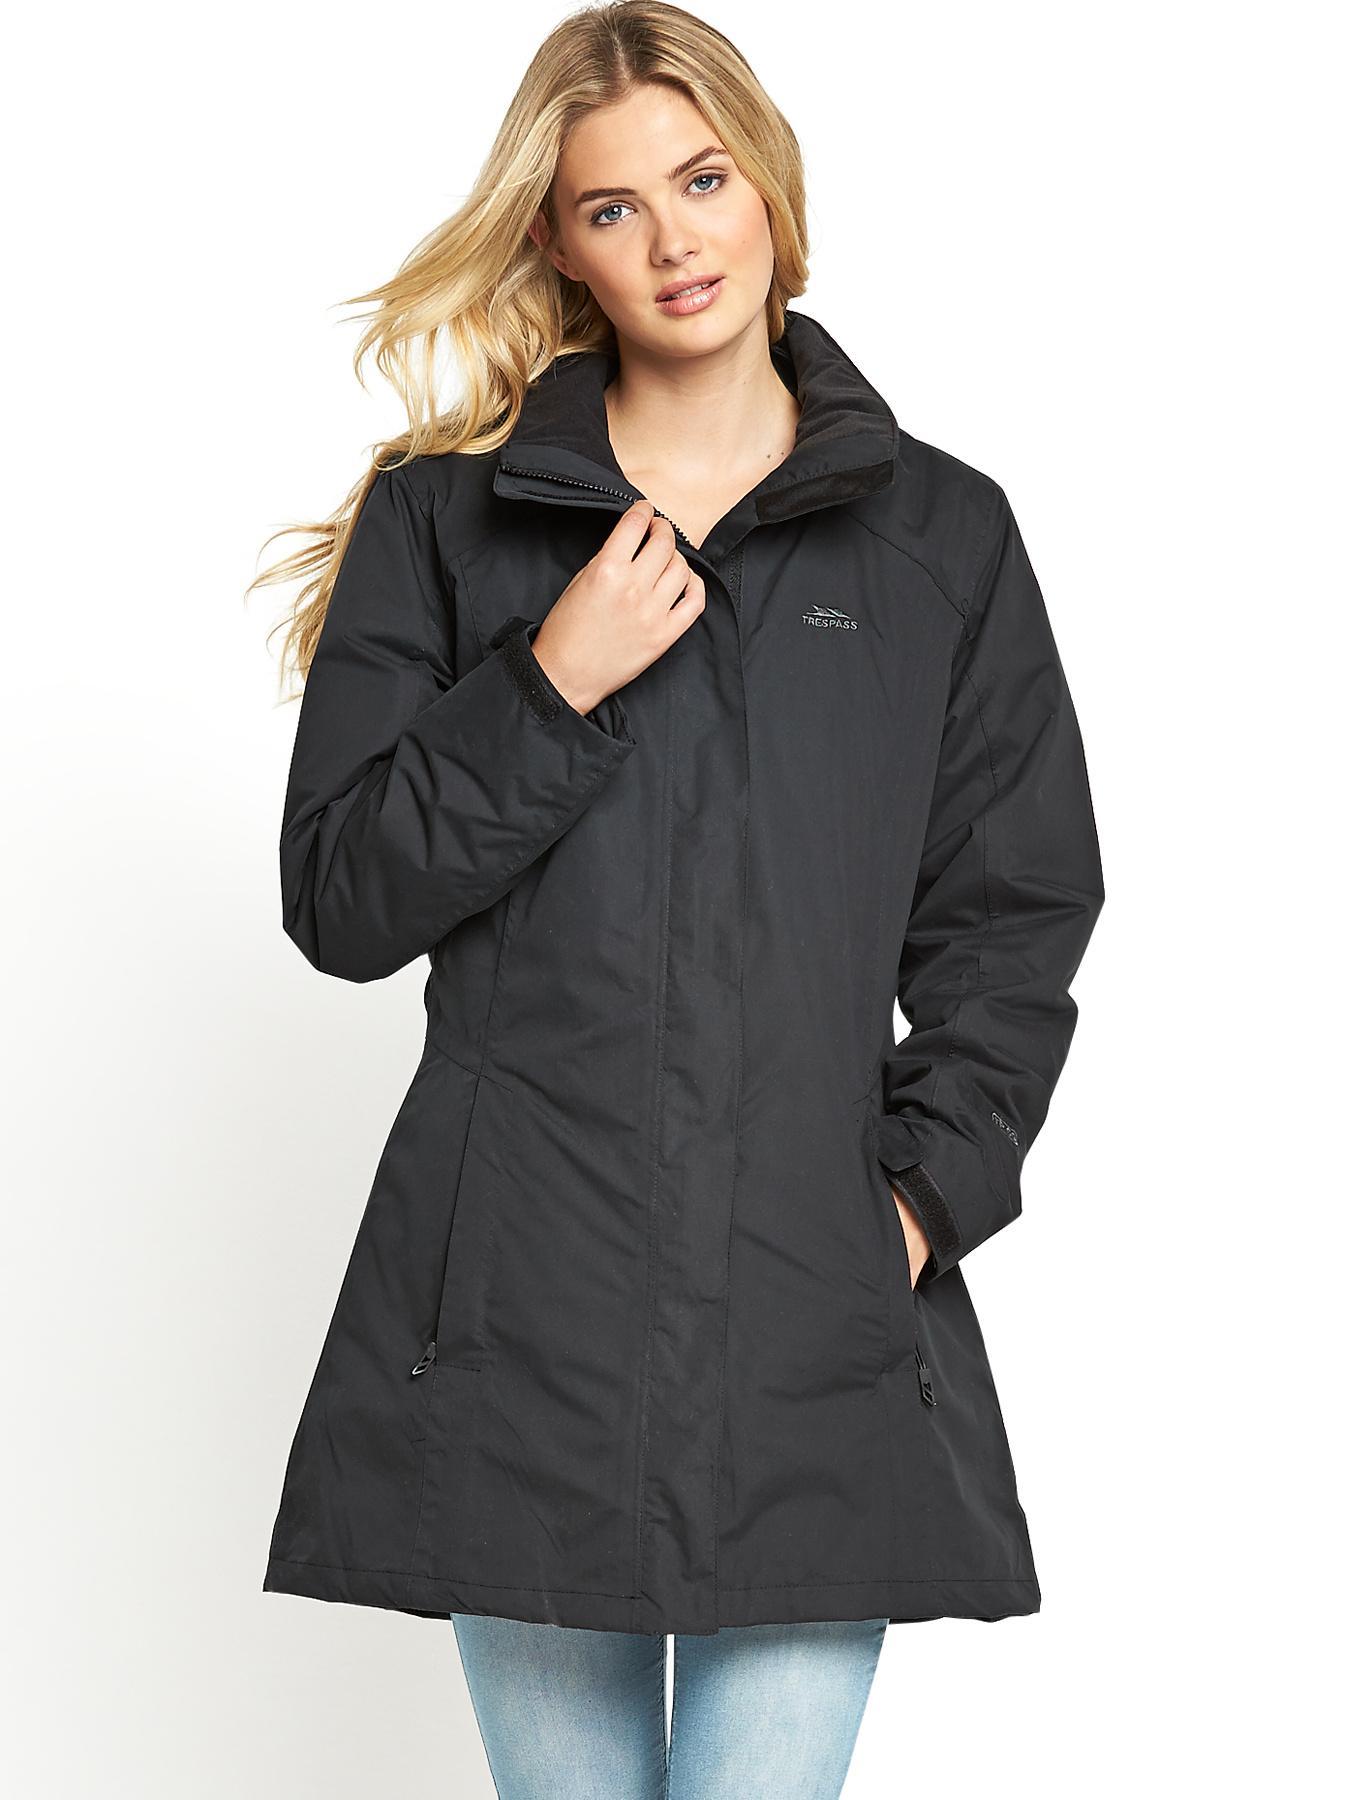 Alissa 3-in-1 Jacket, Black